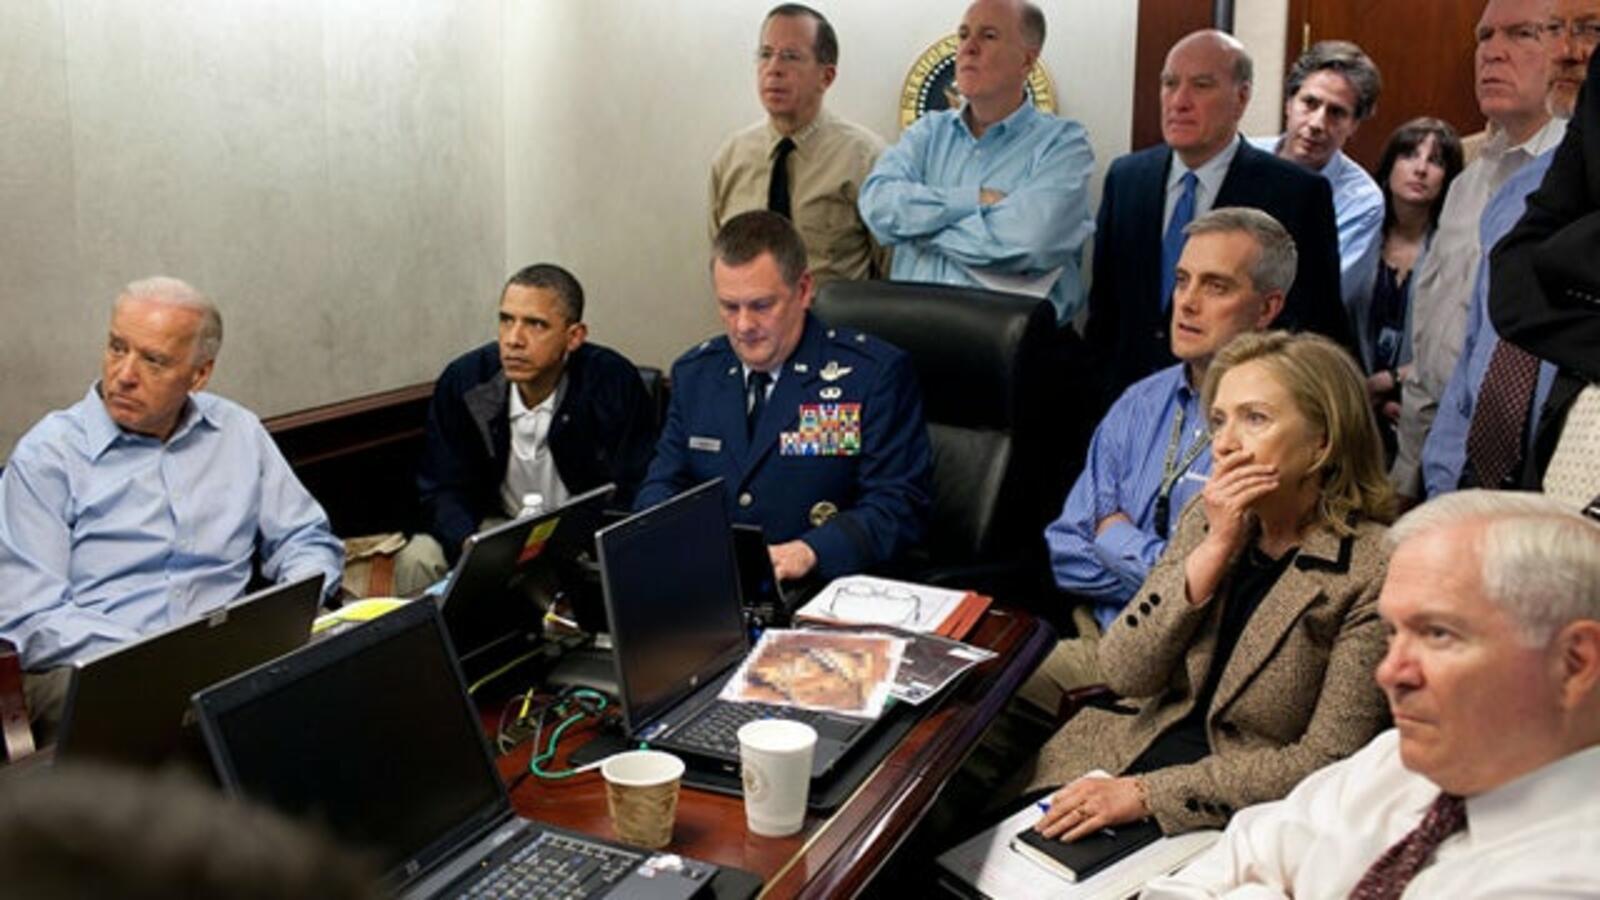 Rush Reminds Us Joe Biden Opposed the Bin Laden Raid